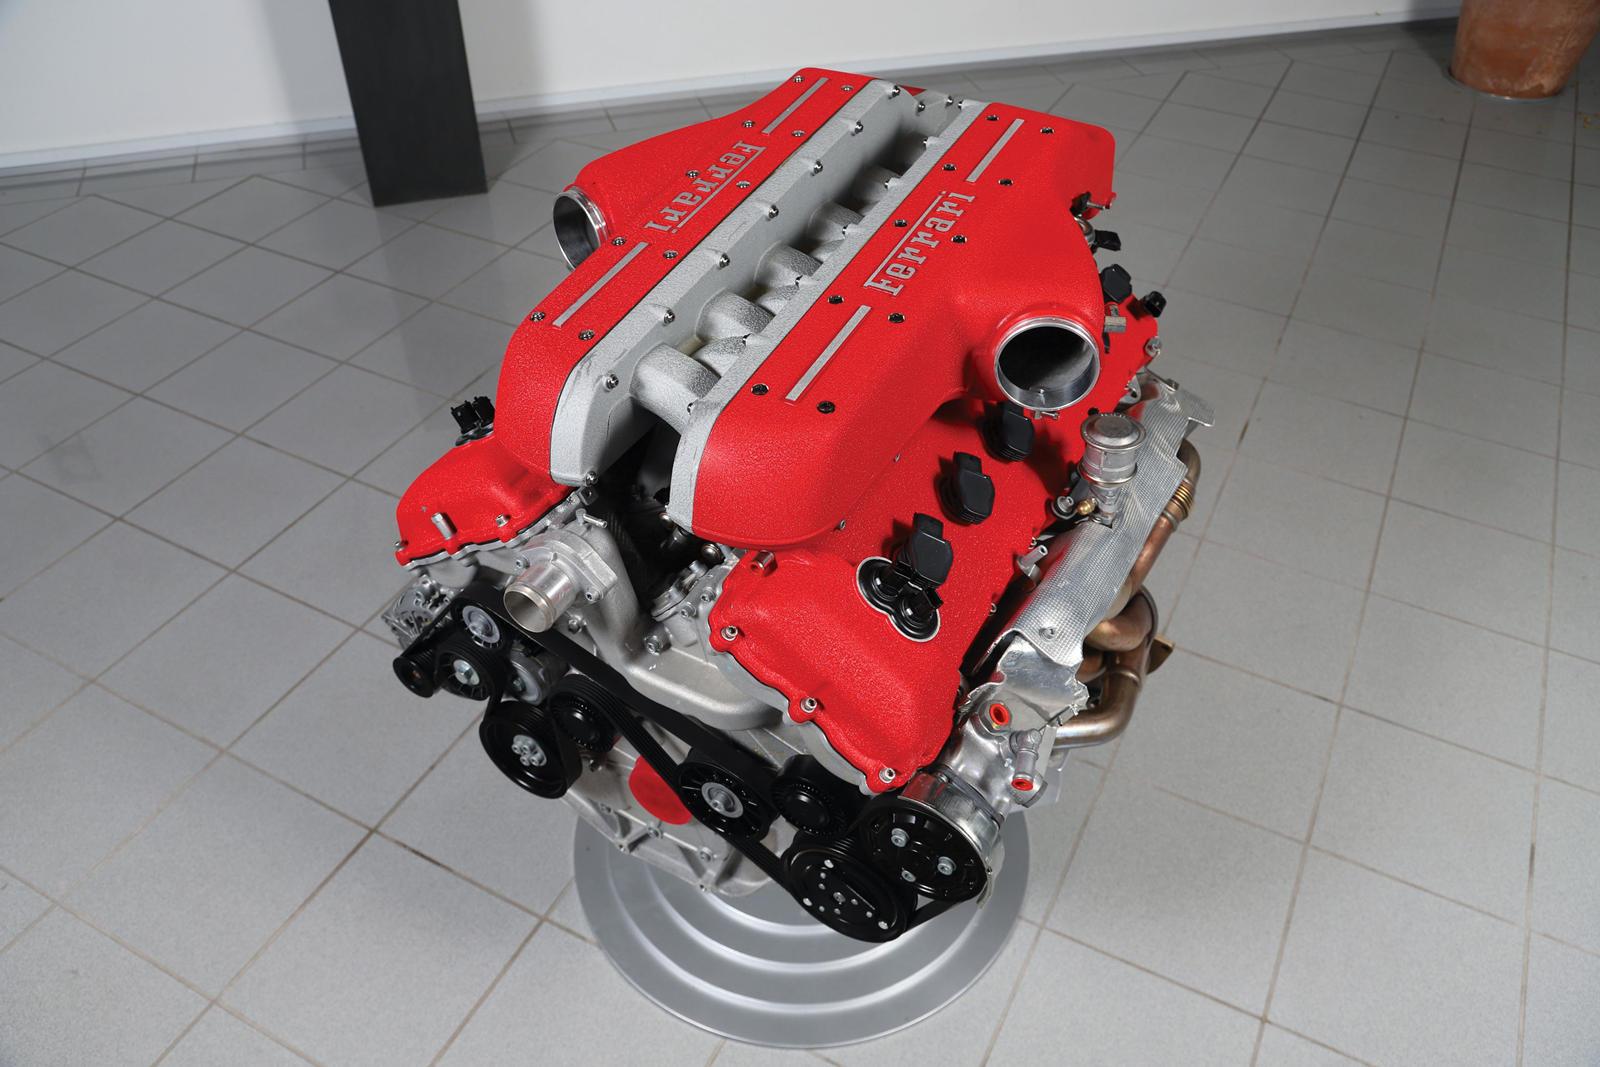 Ferrari F140 Engine